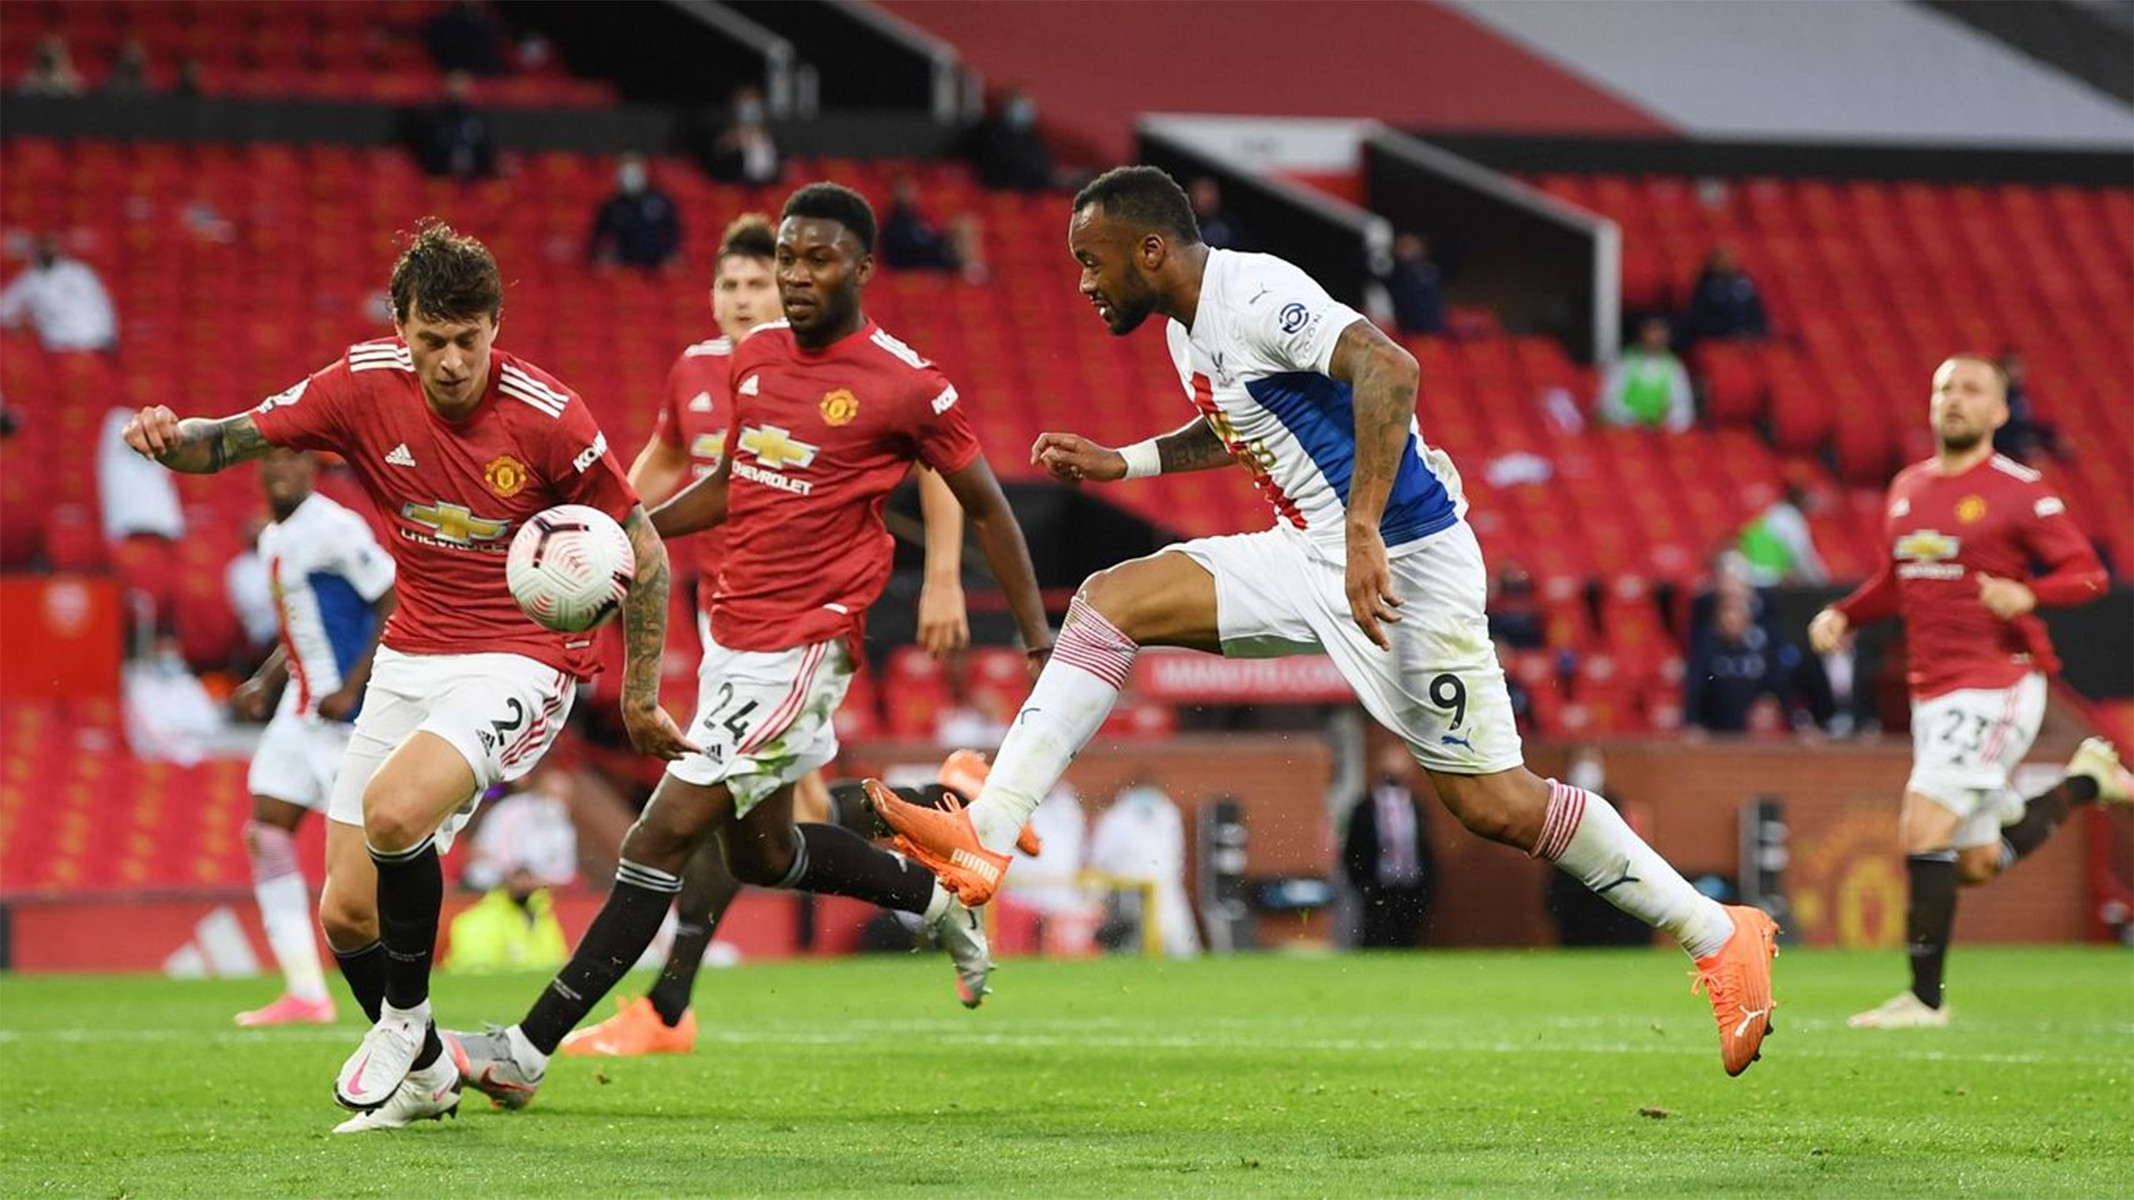 Memalukan! Manchester United Terkapar di Kandang Sendiri - JPNN.com